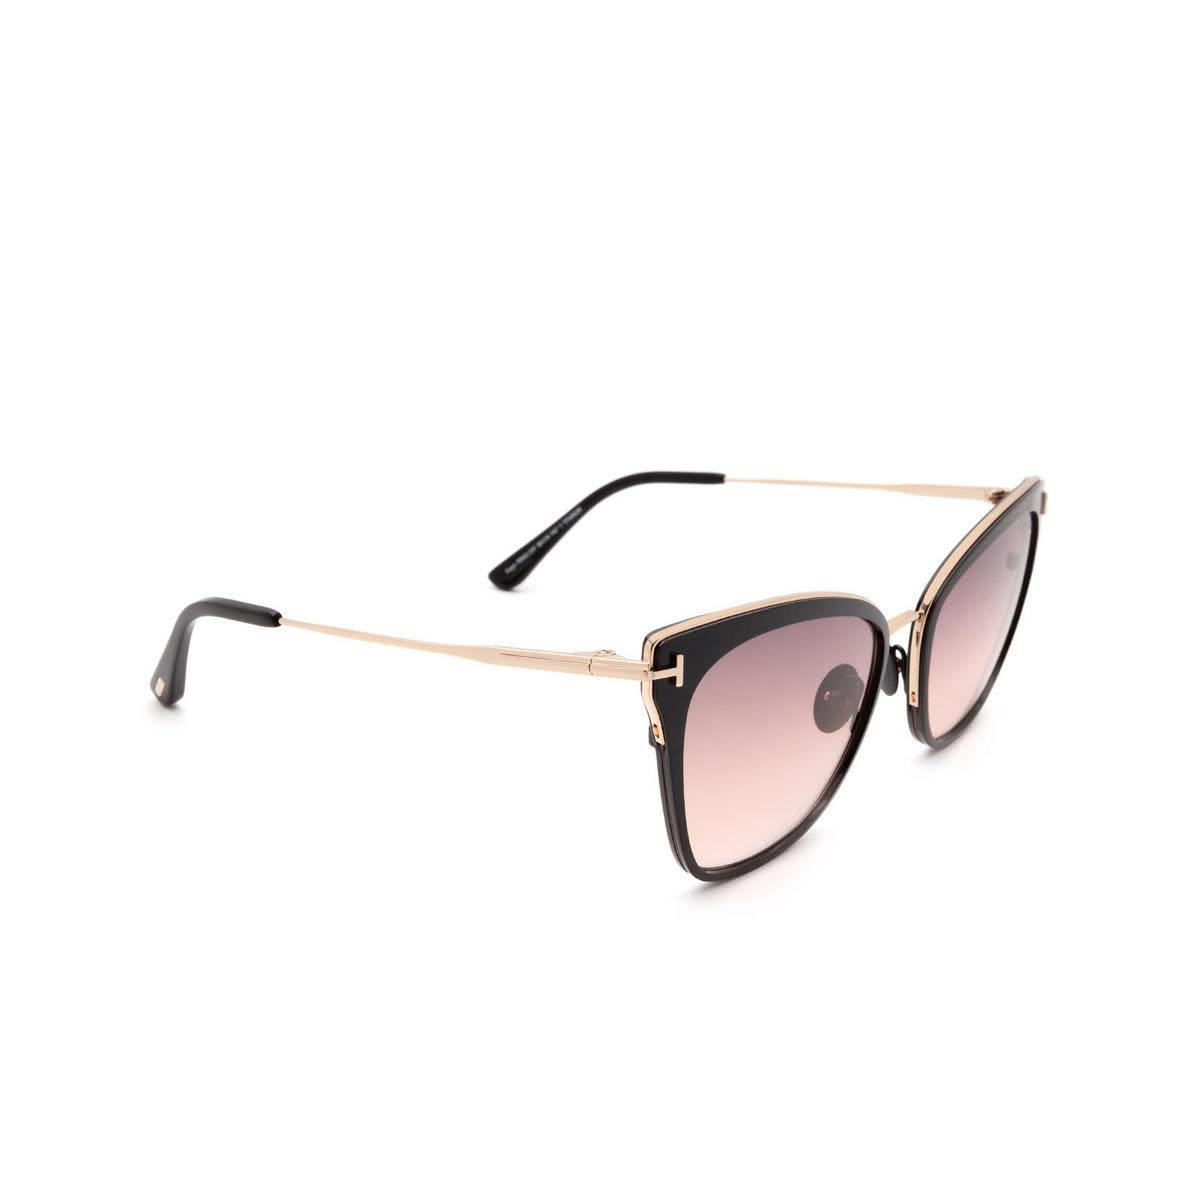 Tom Ford® Cat-eye Sunglasses: Faryn FT0843 color Shiny Black 01F.